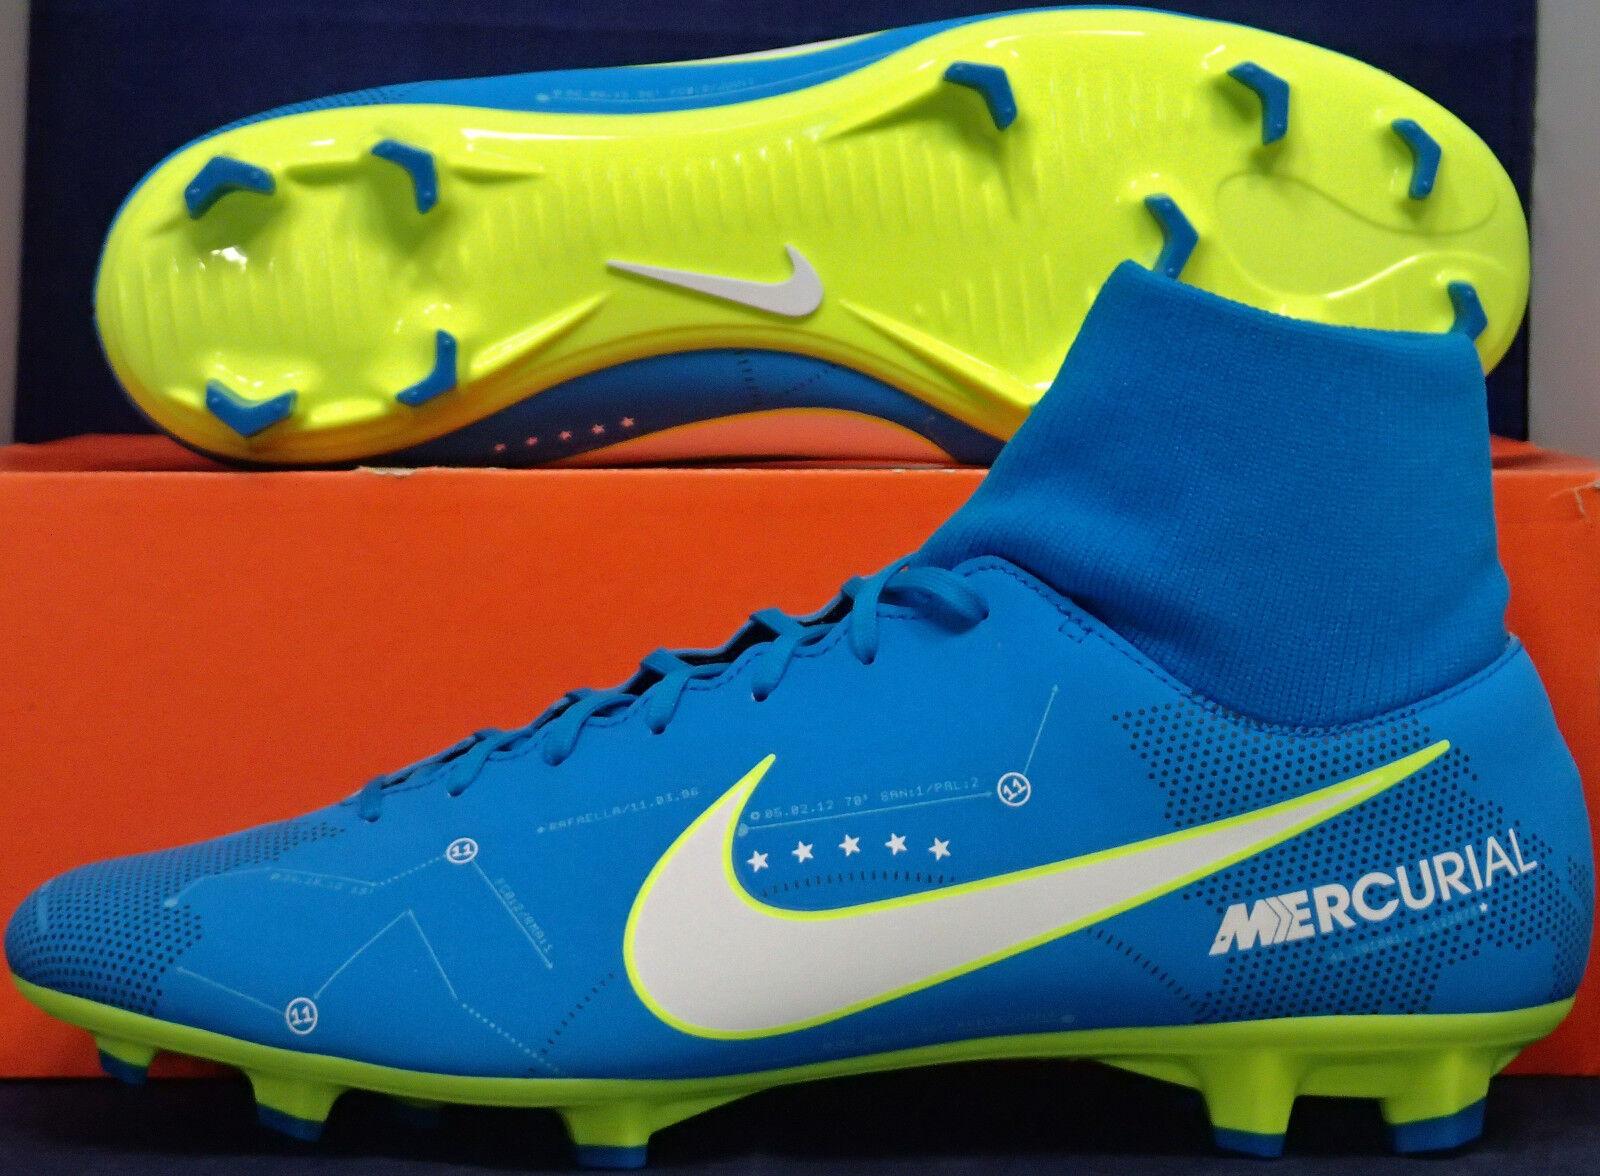 Nike Mercurial Victory VI 6 DF NJR FG Neymar JR. Cleats SZ US 8 ( 921506-400 )